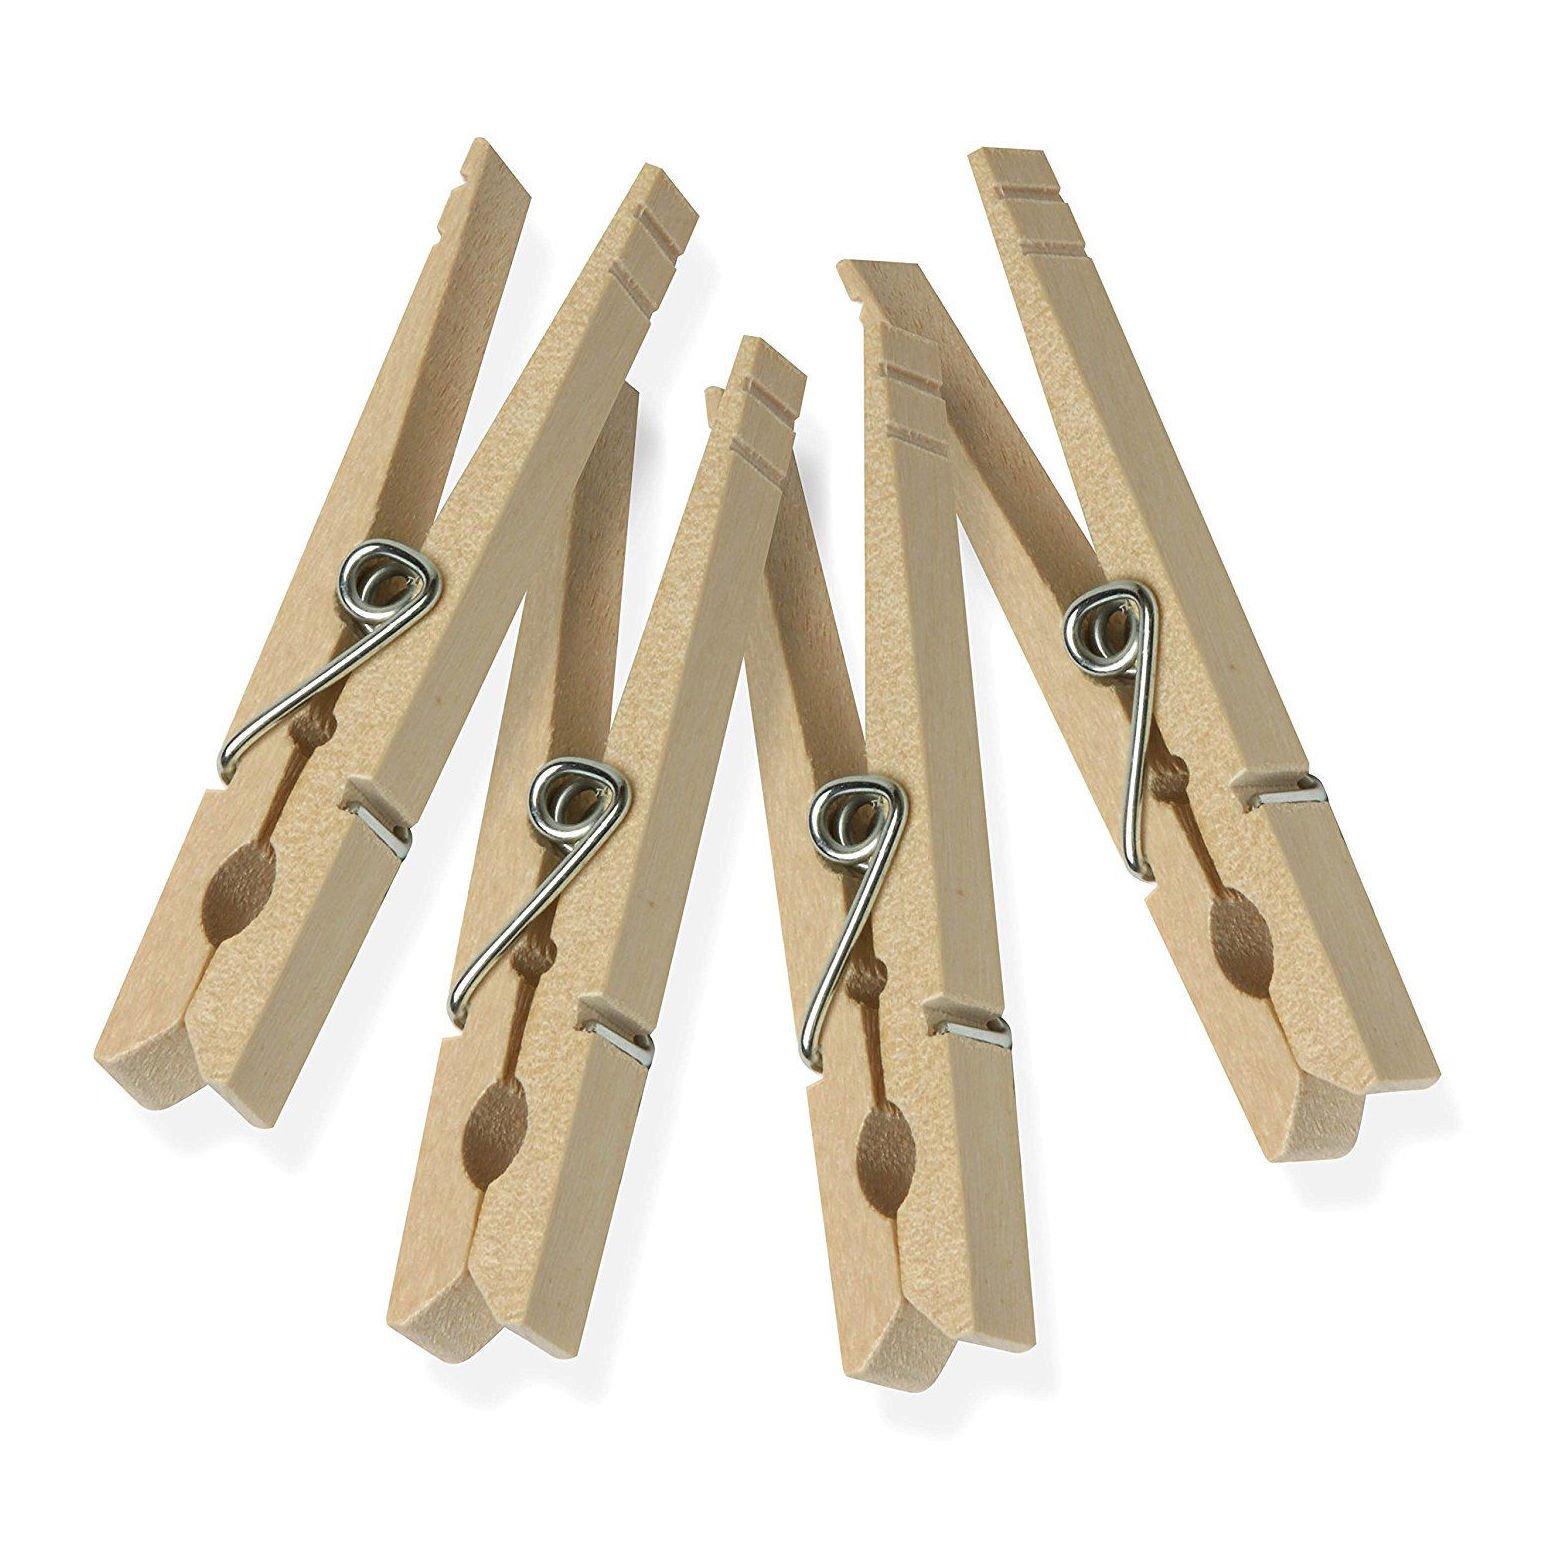 100 Wooden Clothespins